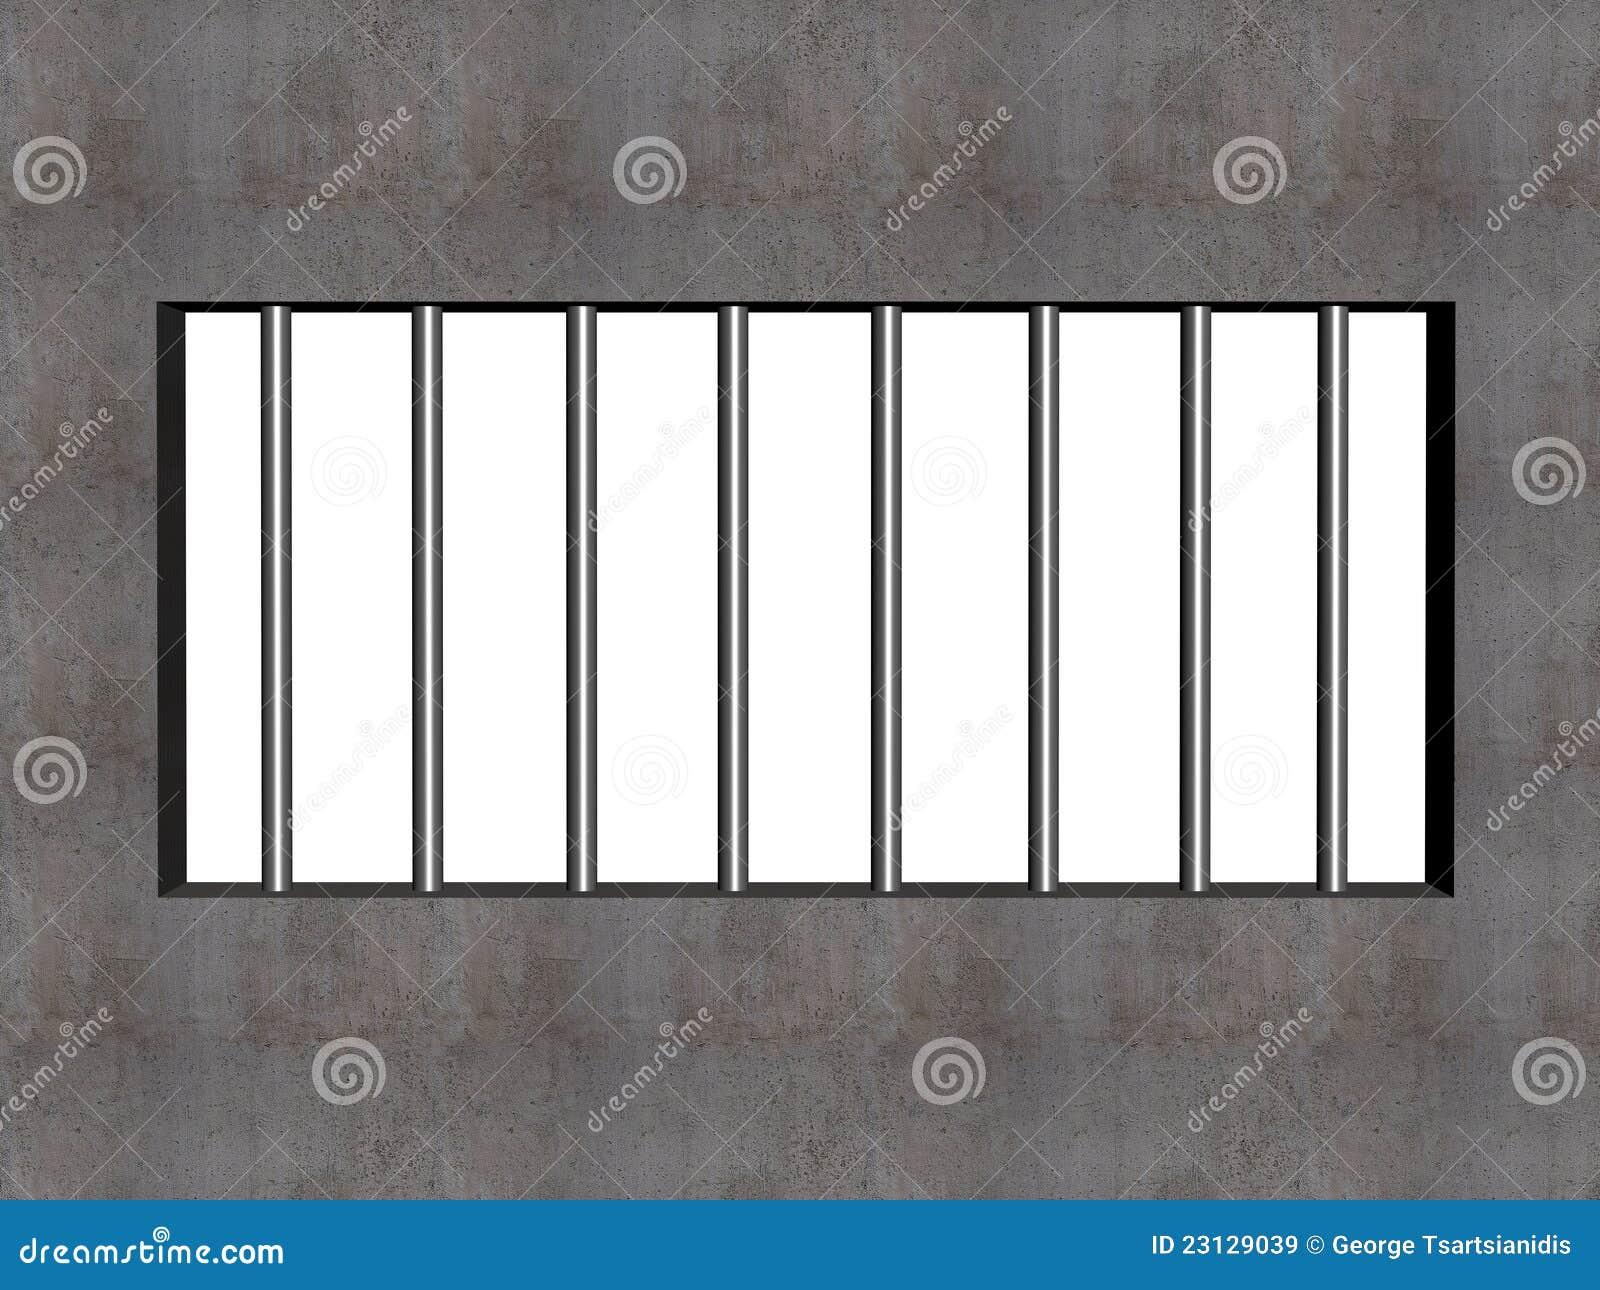 Penitentiary Stock Illustrationen, Vektors, & Klipart – (495 Stock ...